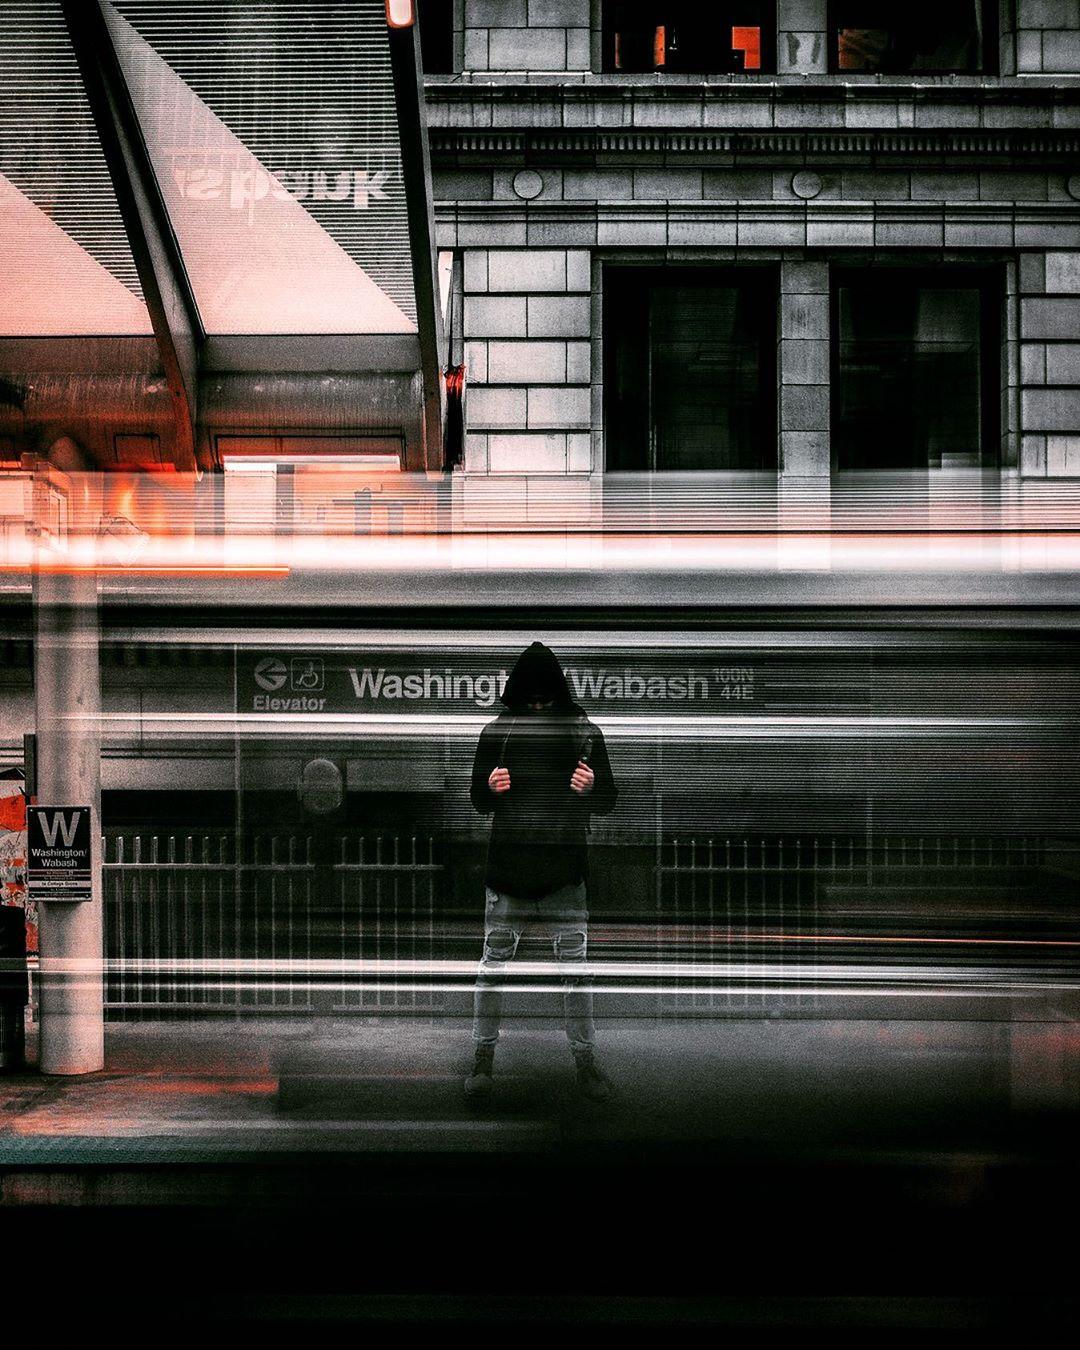 Улицы Чикаго на снимках Бенджамина Сутера